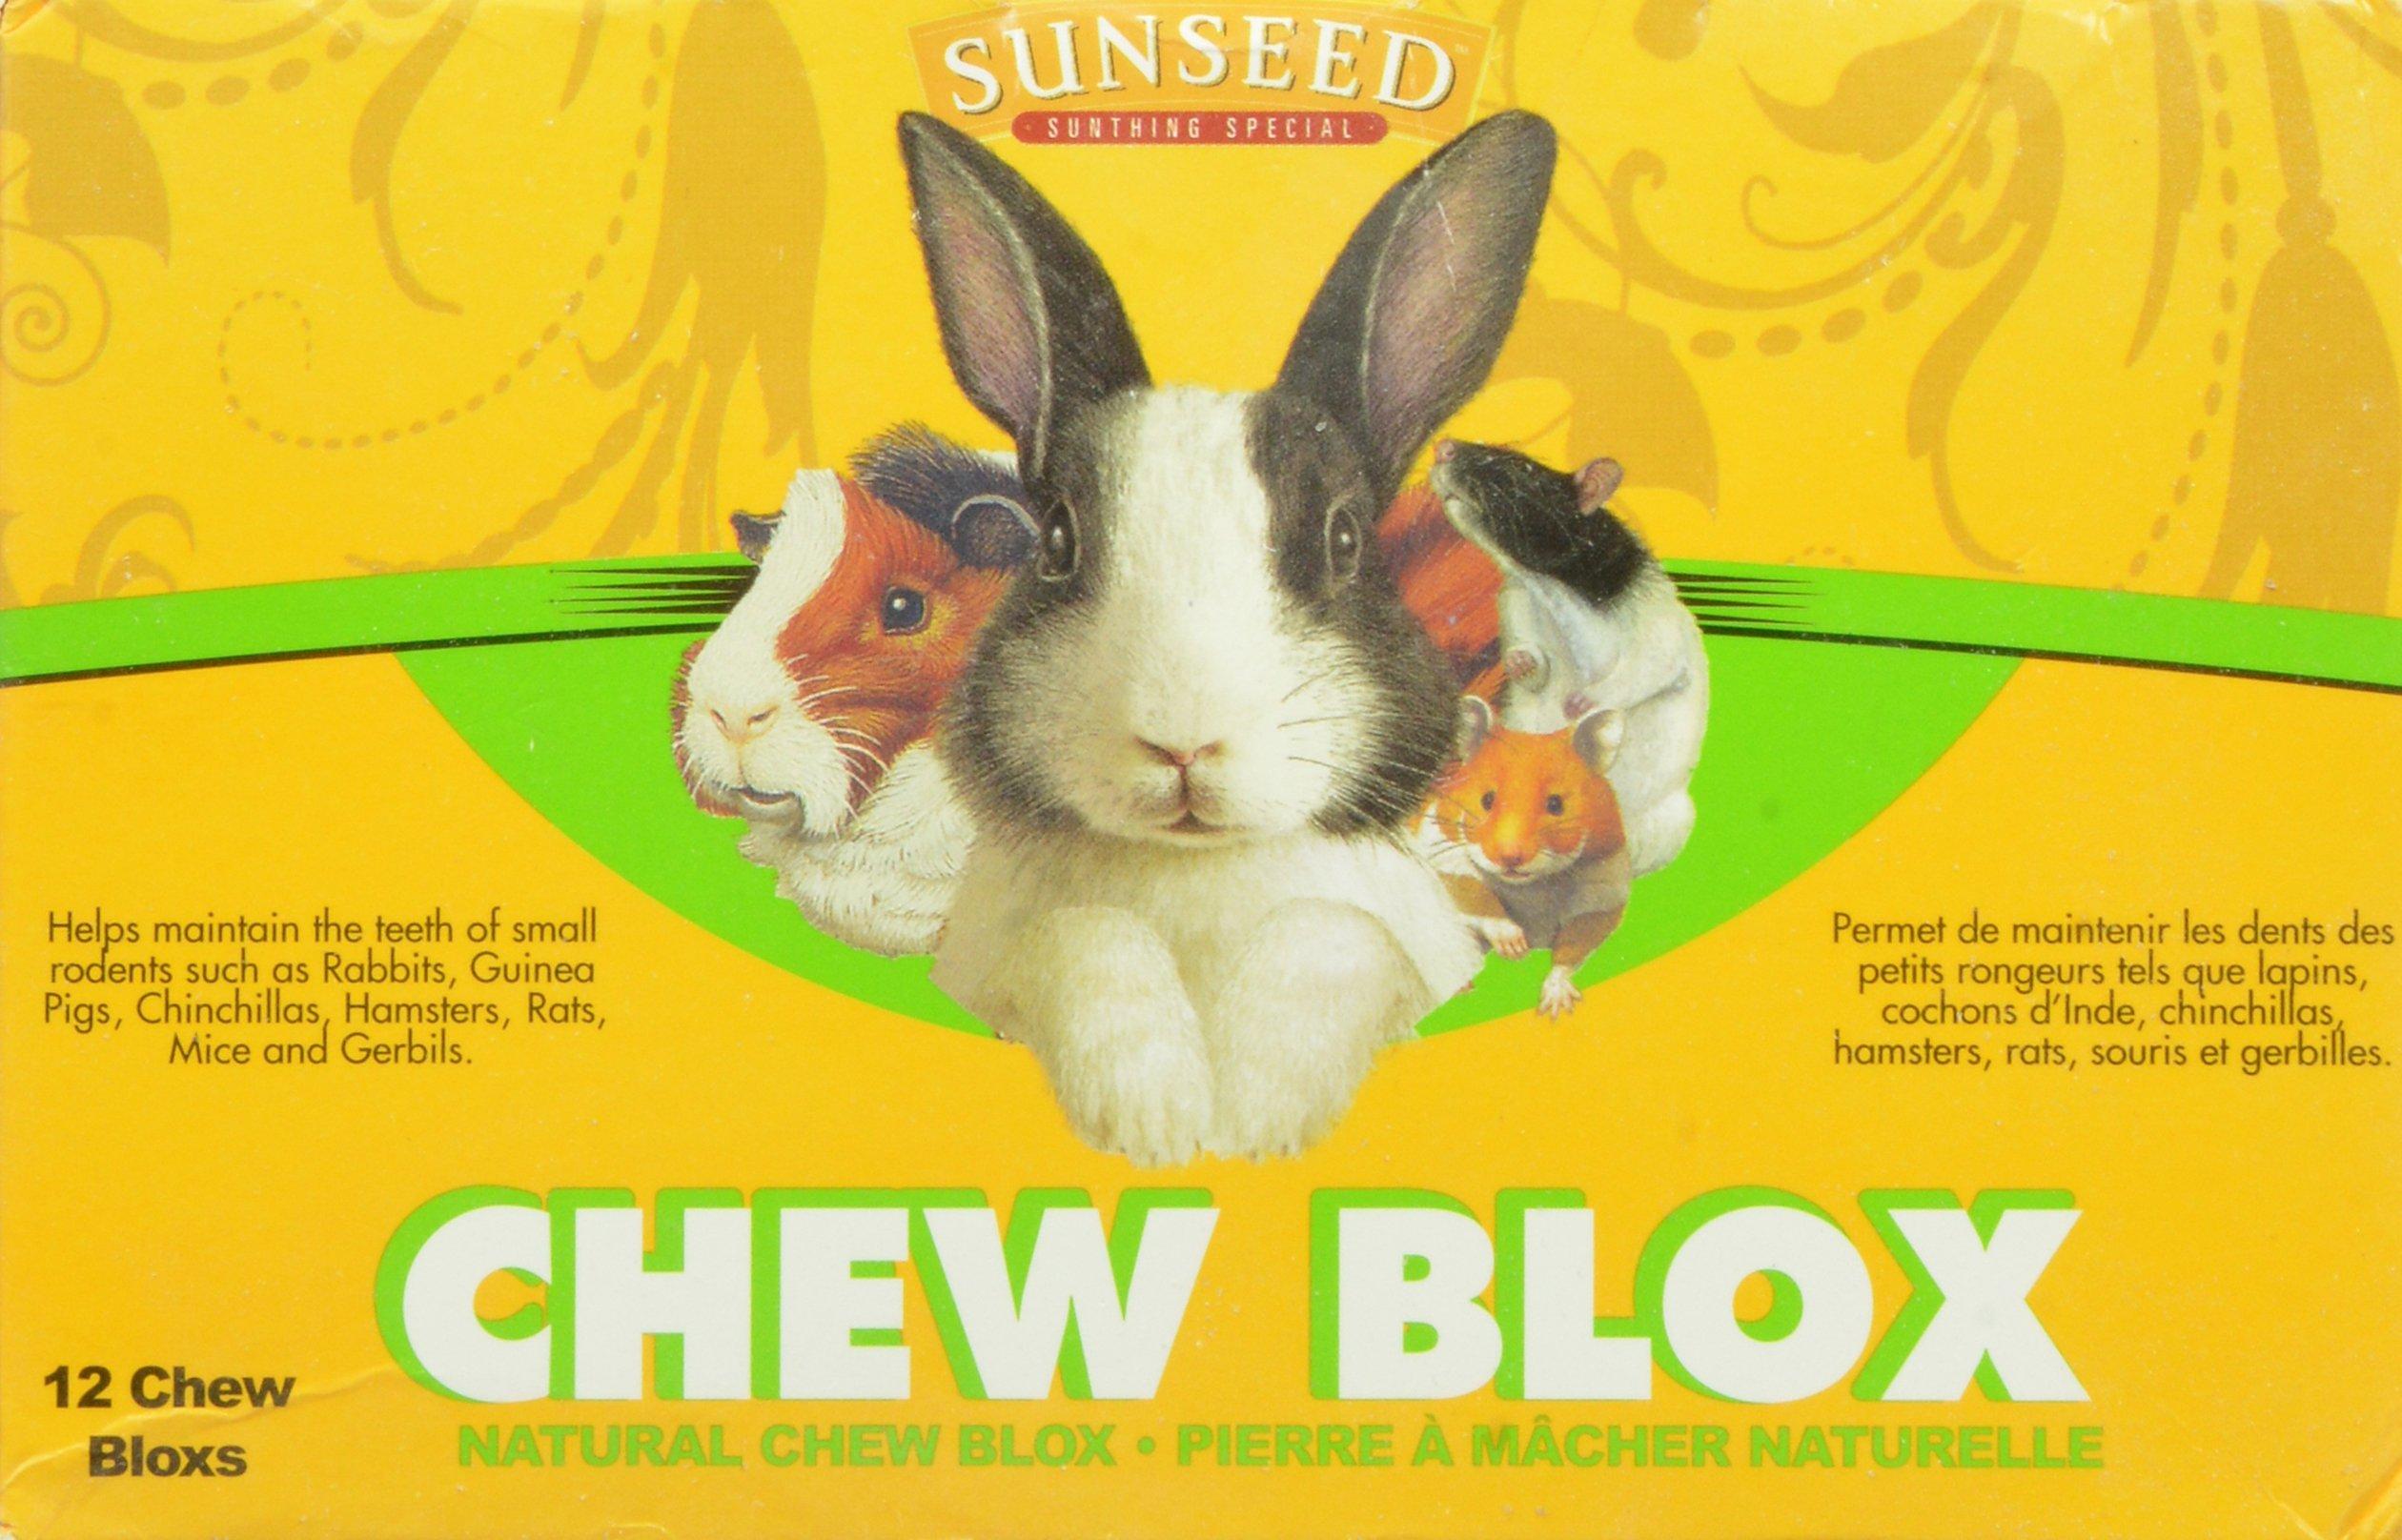 Sun Seed Company Sss39400 12-Pack Chinchilla Wood Chew Blox Display by Sun Seed